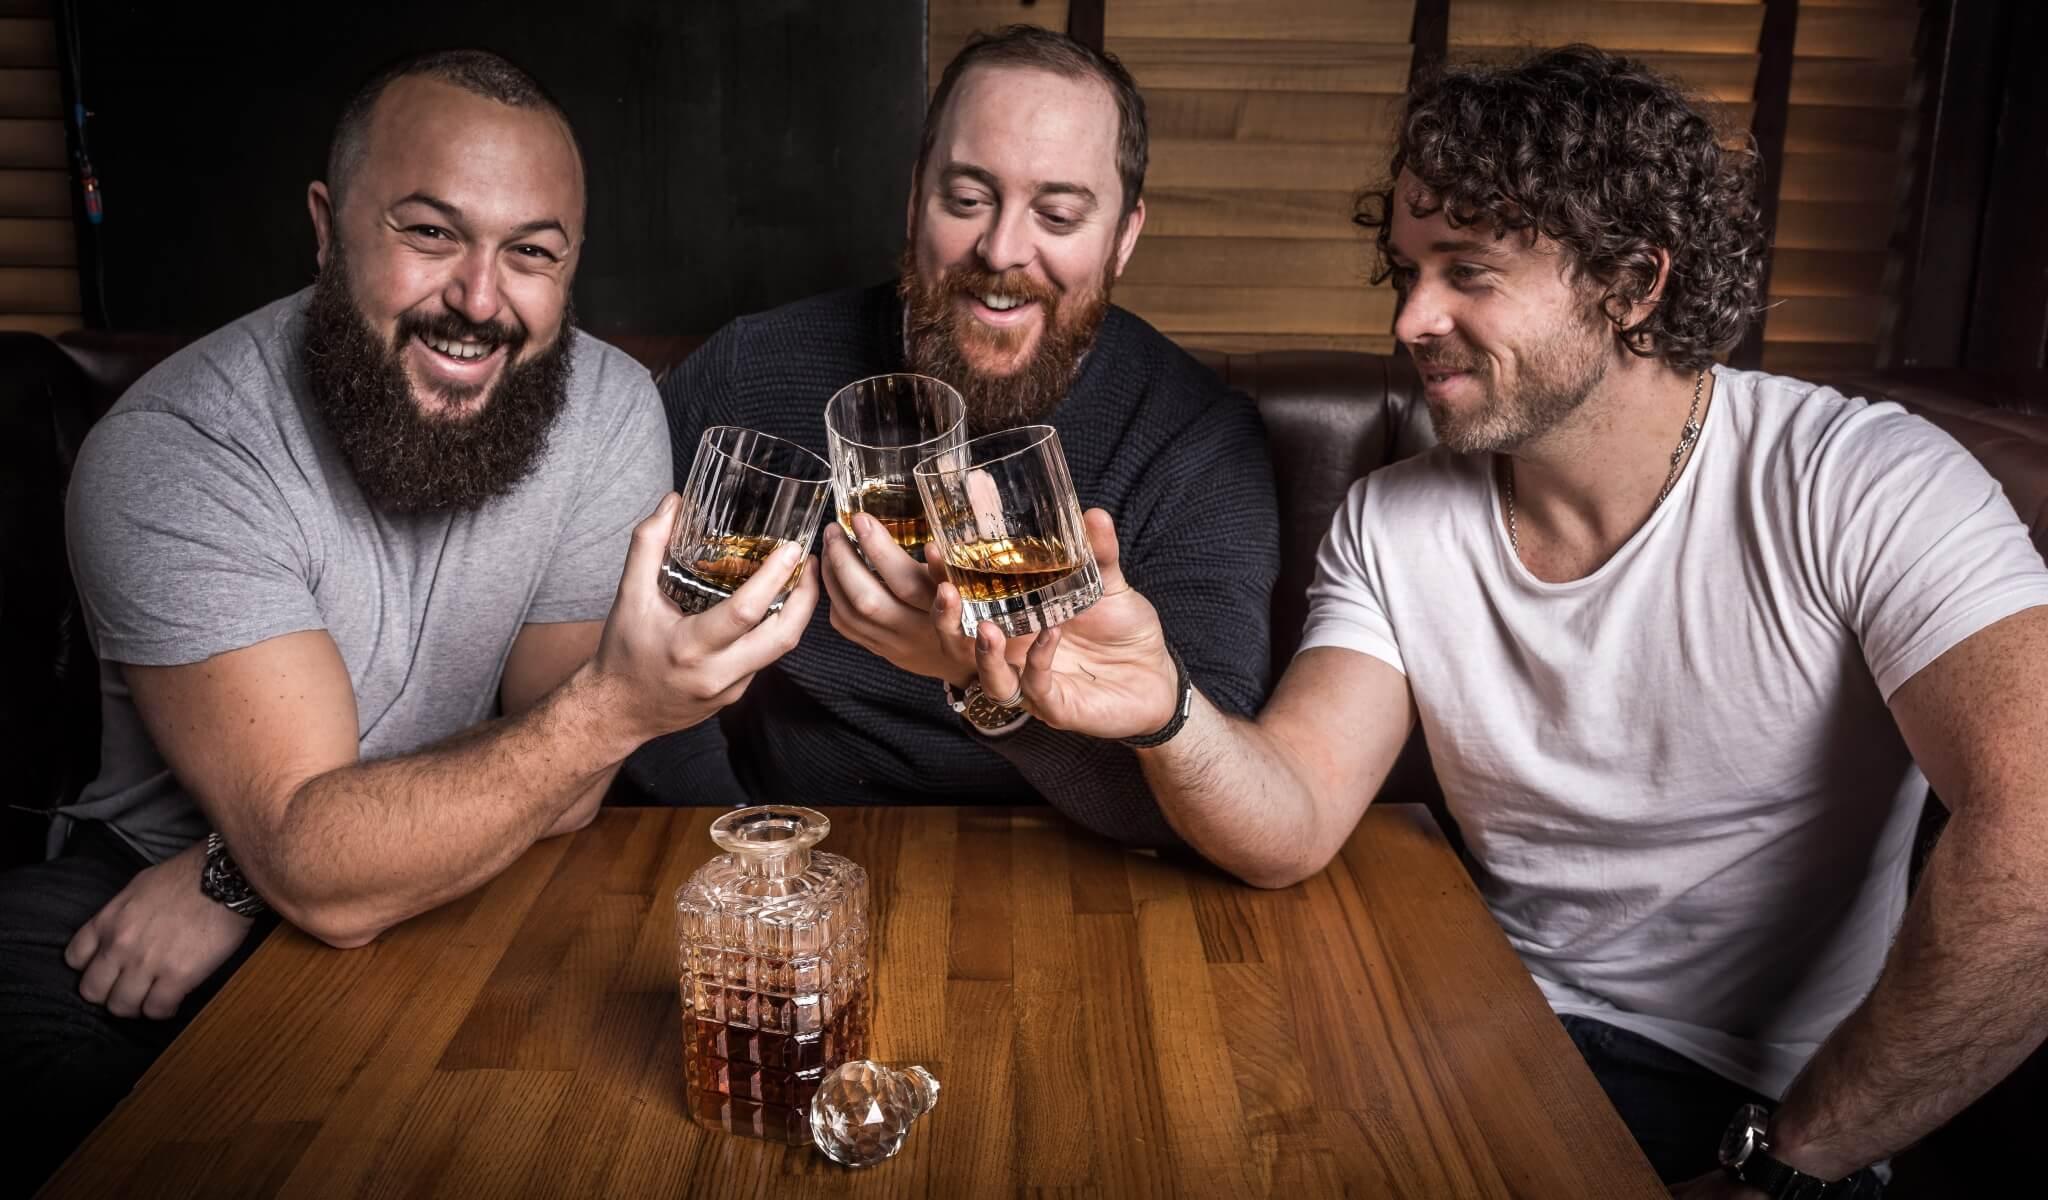 John Ennis, Nick Thomas and Matt Farrell raising a toast